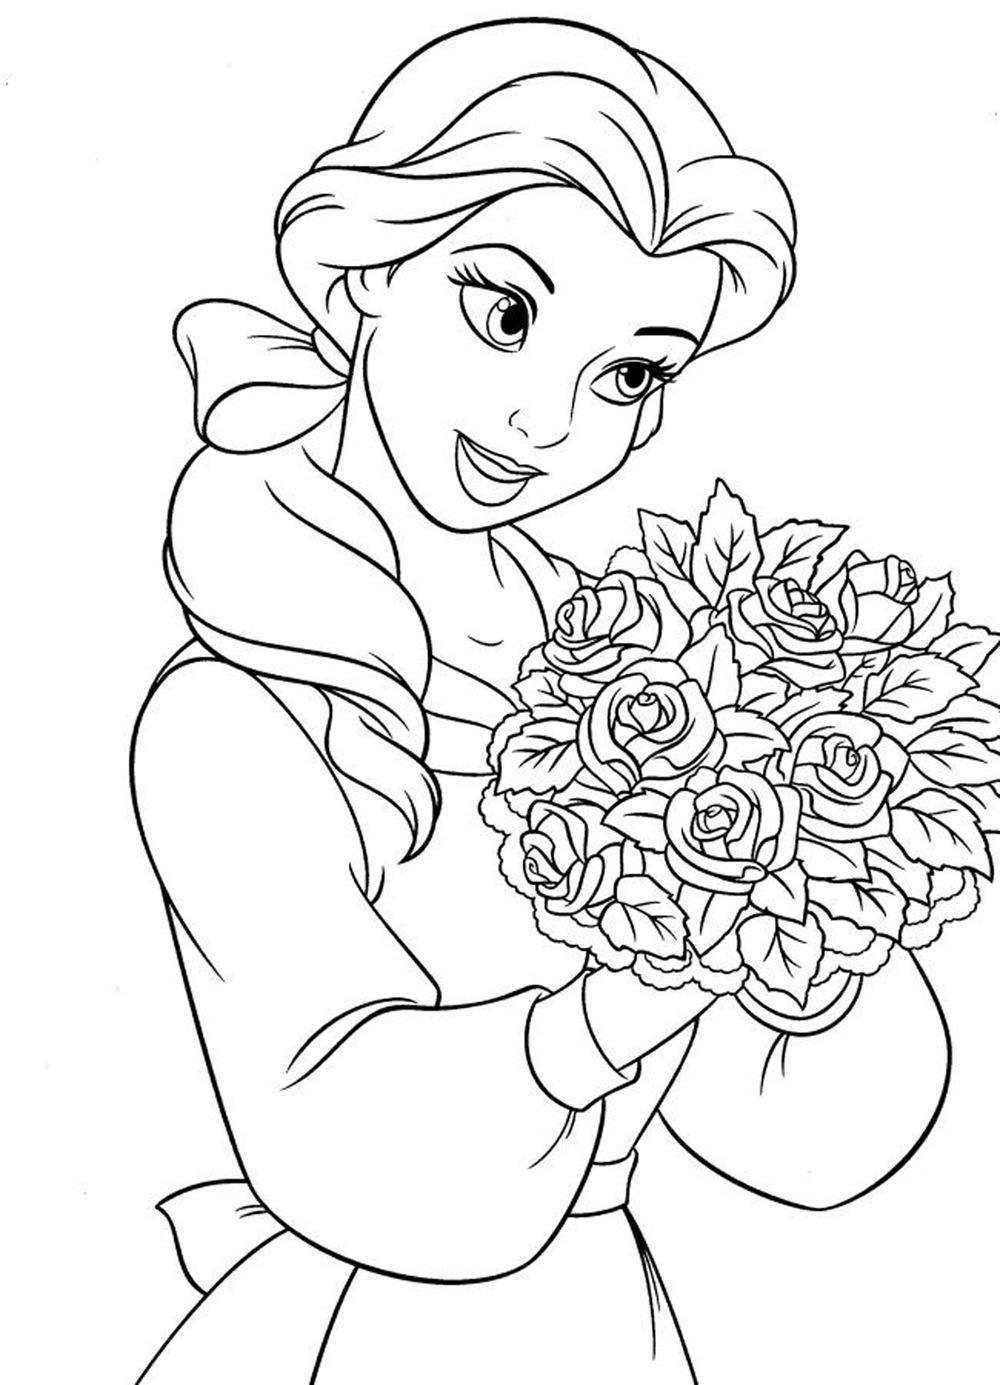 Dibujos de Princesas Disney para colorear e imprimir gratis